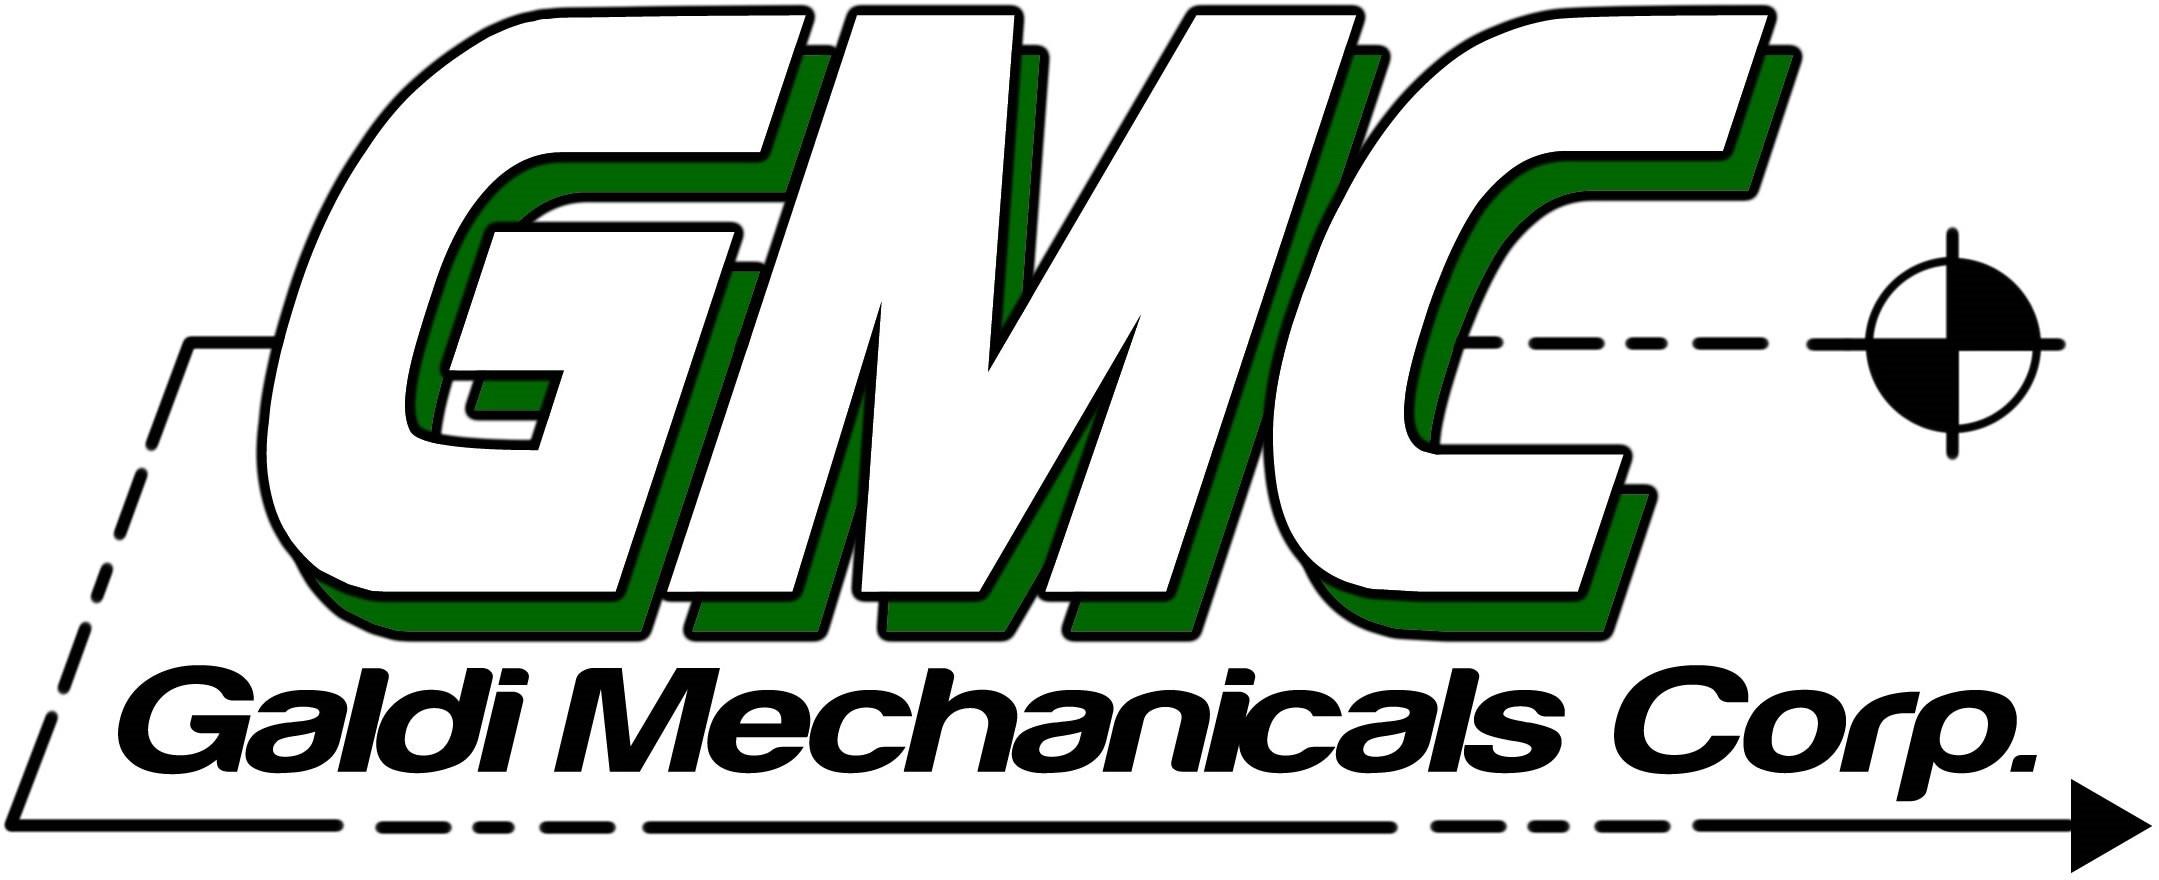 Galdi Mechanicals Corp